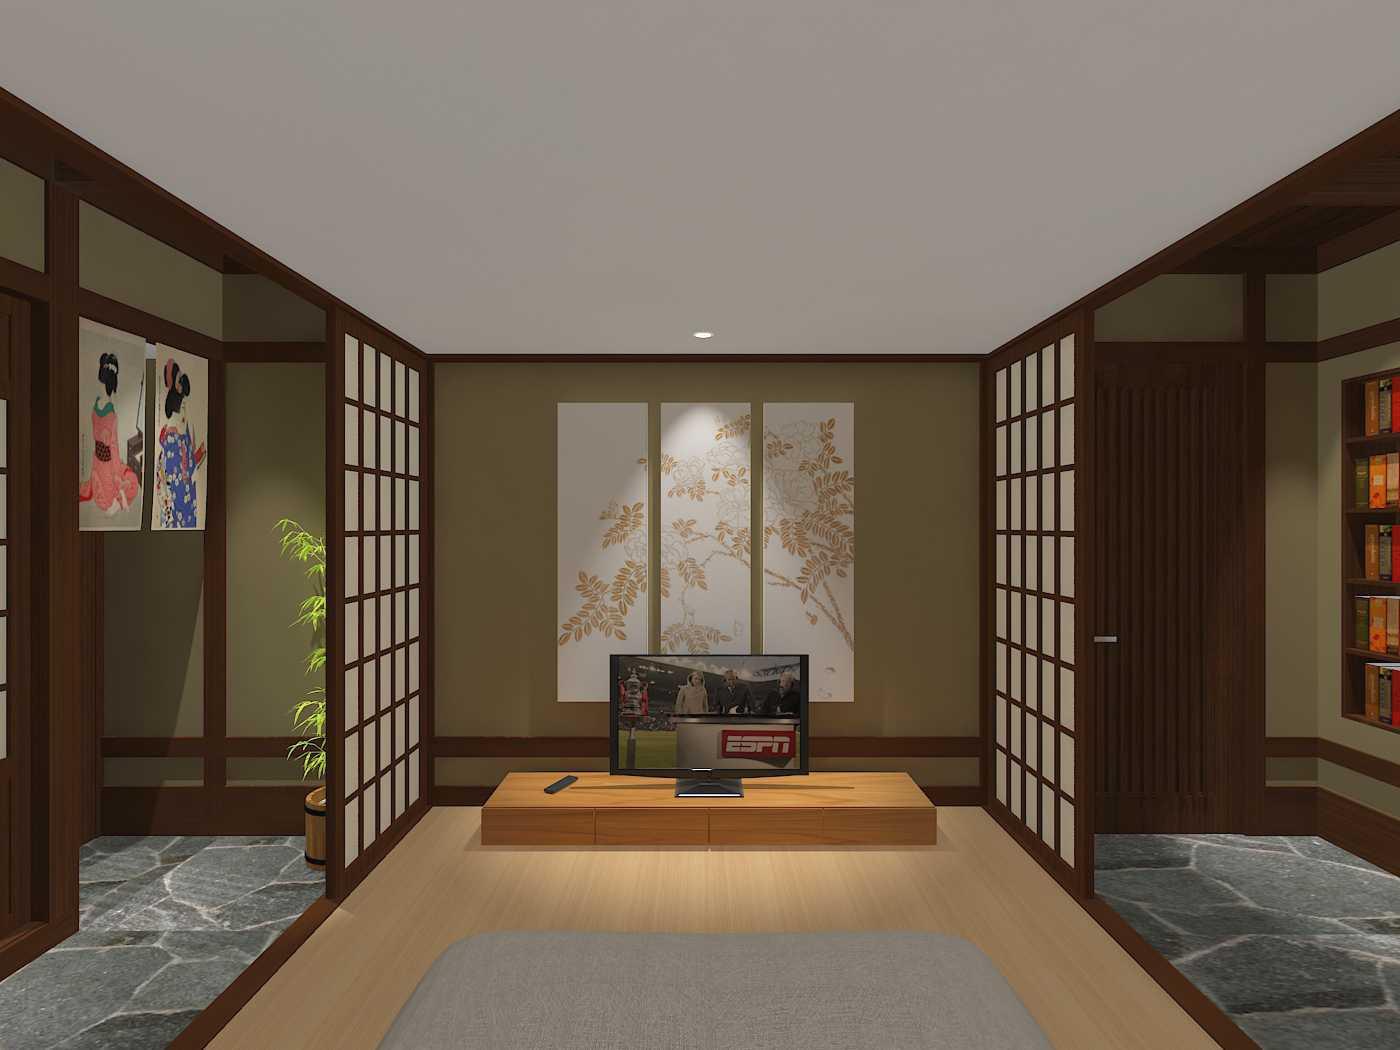 E'architect (Emil Yusman) Desain Interior Rumah Riscon Hills Jl. Bambu Hitam No.76, Rt.4/rw.1, Cipayung, Kota Jakarta Timur, Daerah Khusus Ibukota Jakarta 13840, Indonesia East Jakarta Children-Bedroom Modern 20177